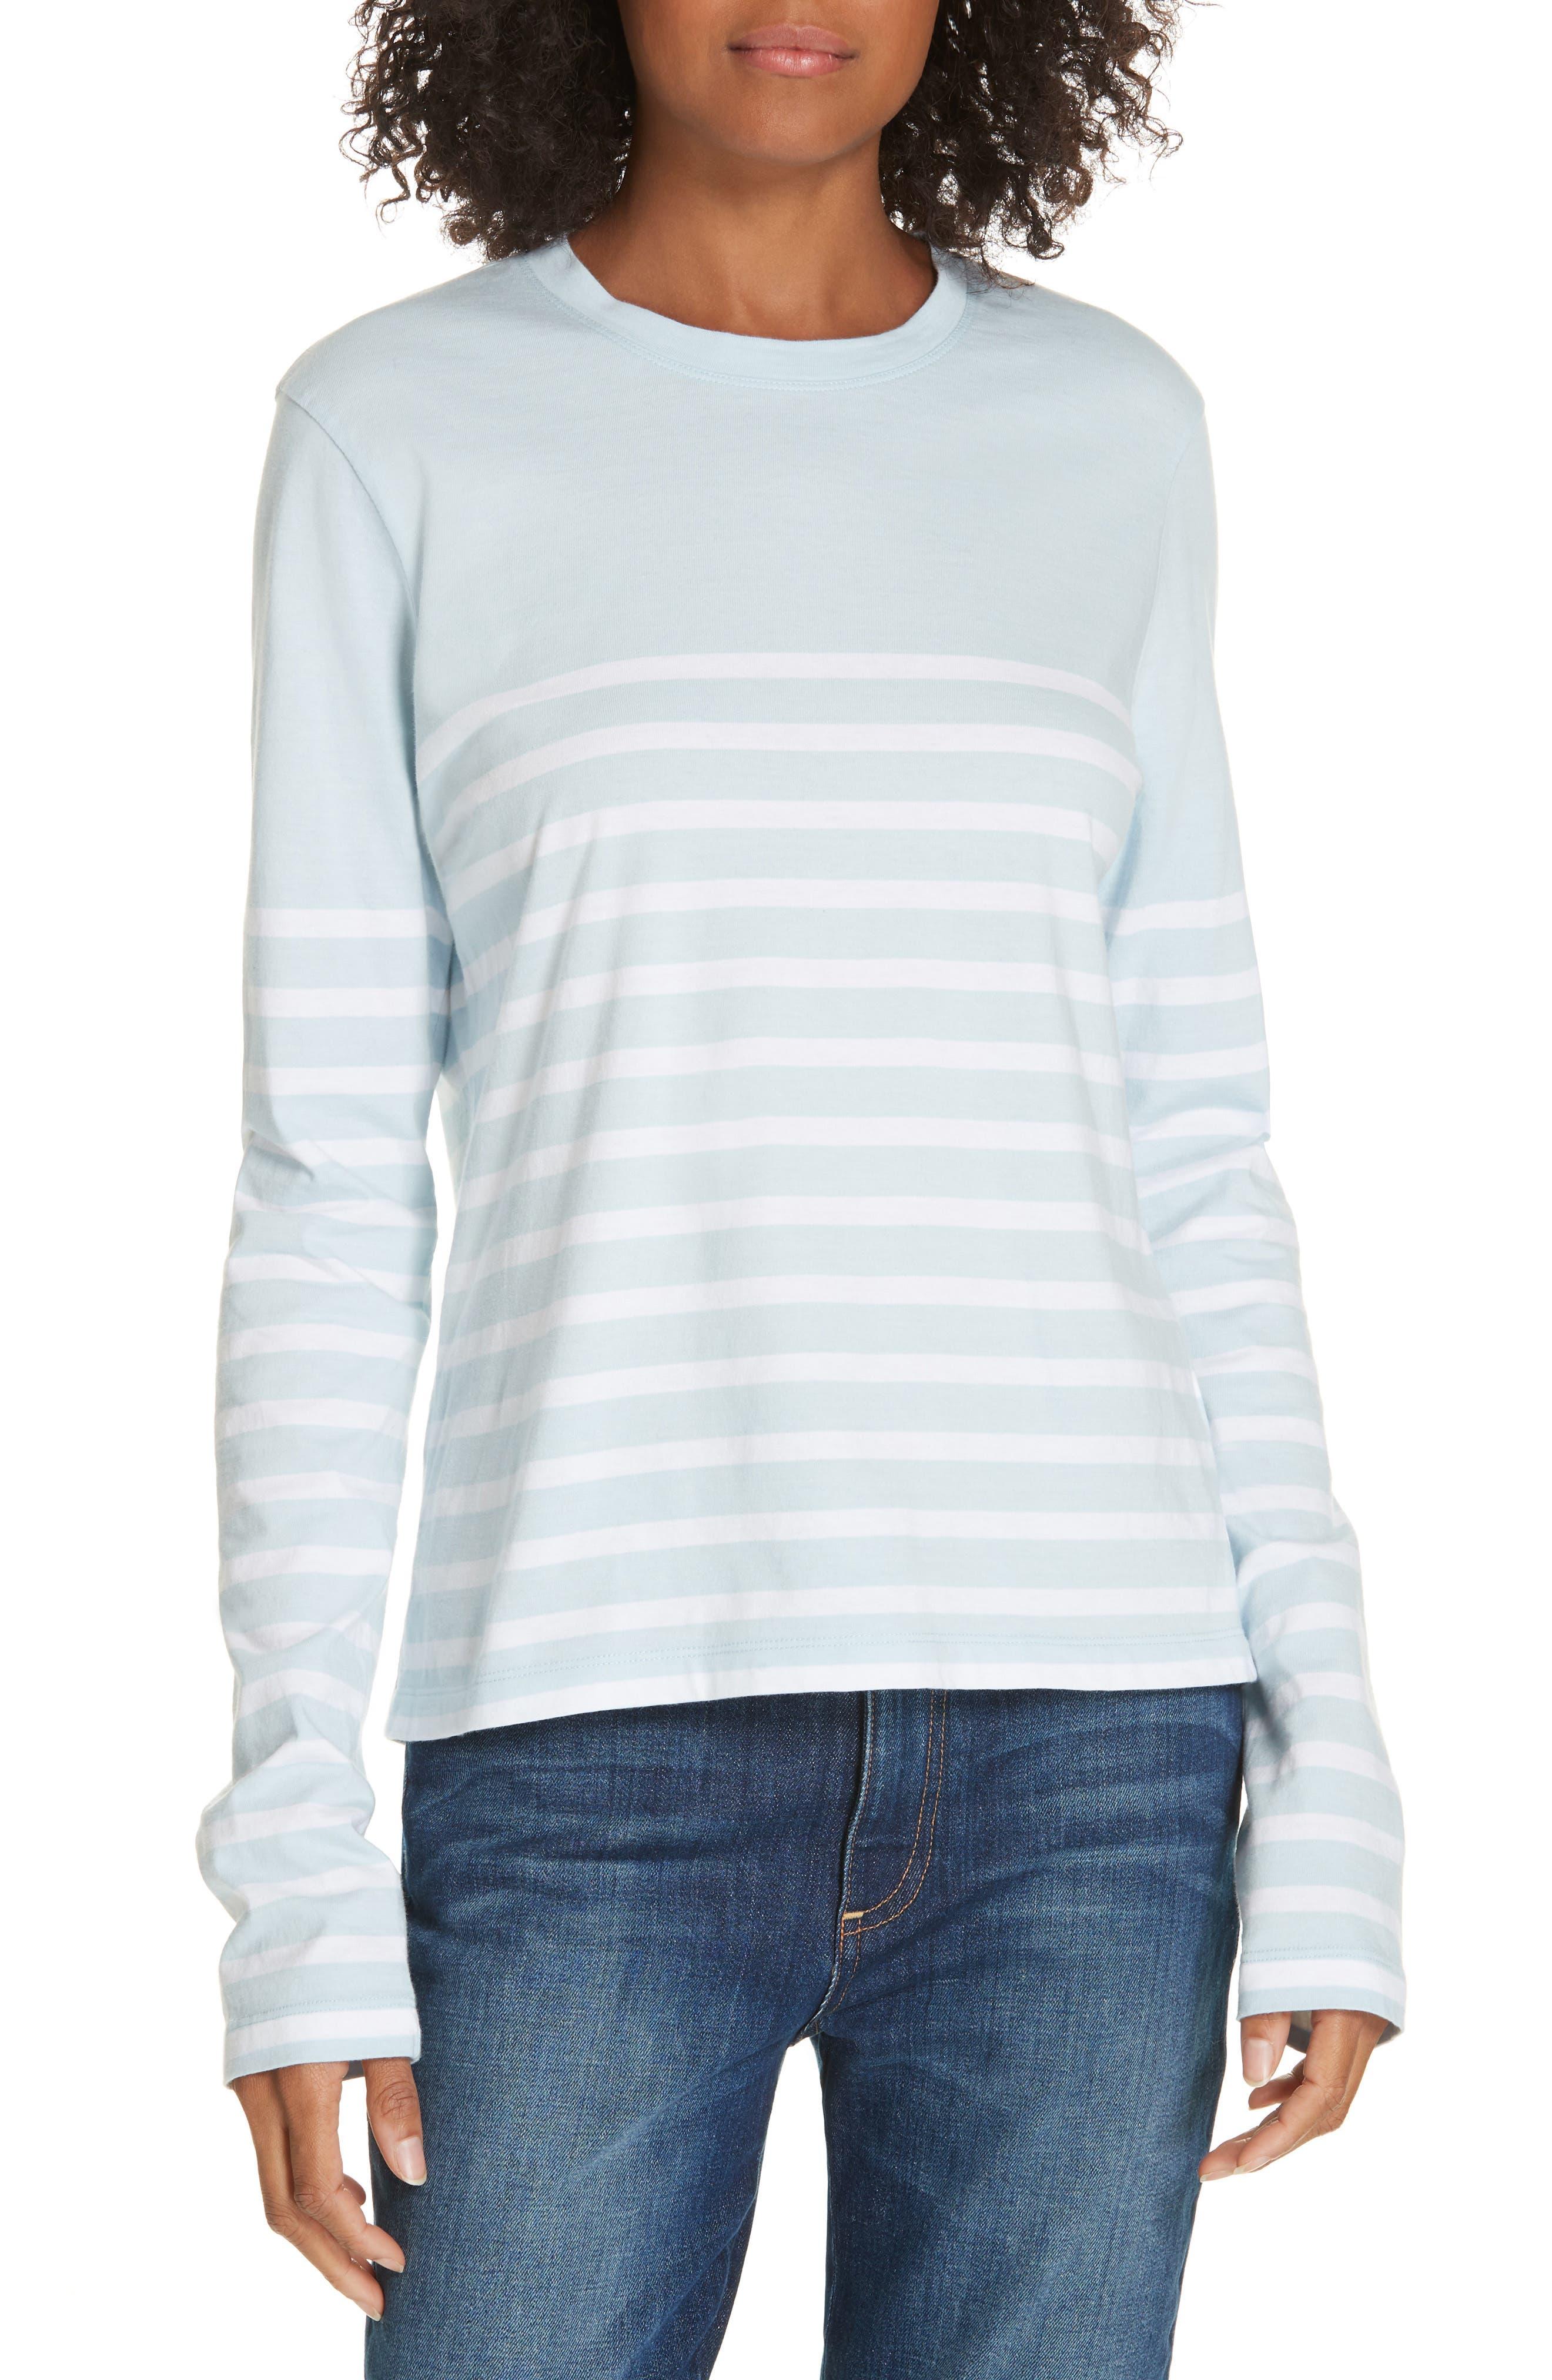 Lean Lines Tee,                         Main,                         color, LIGHT BLUE/ WHITE STRIPES